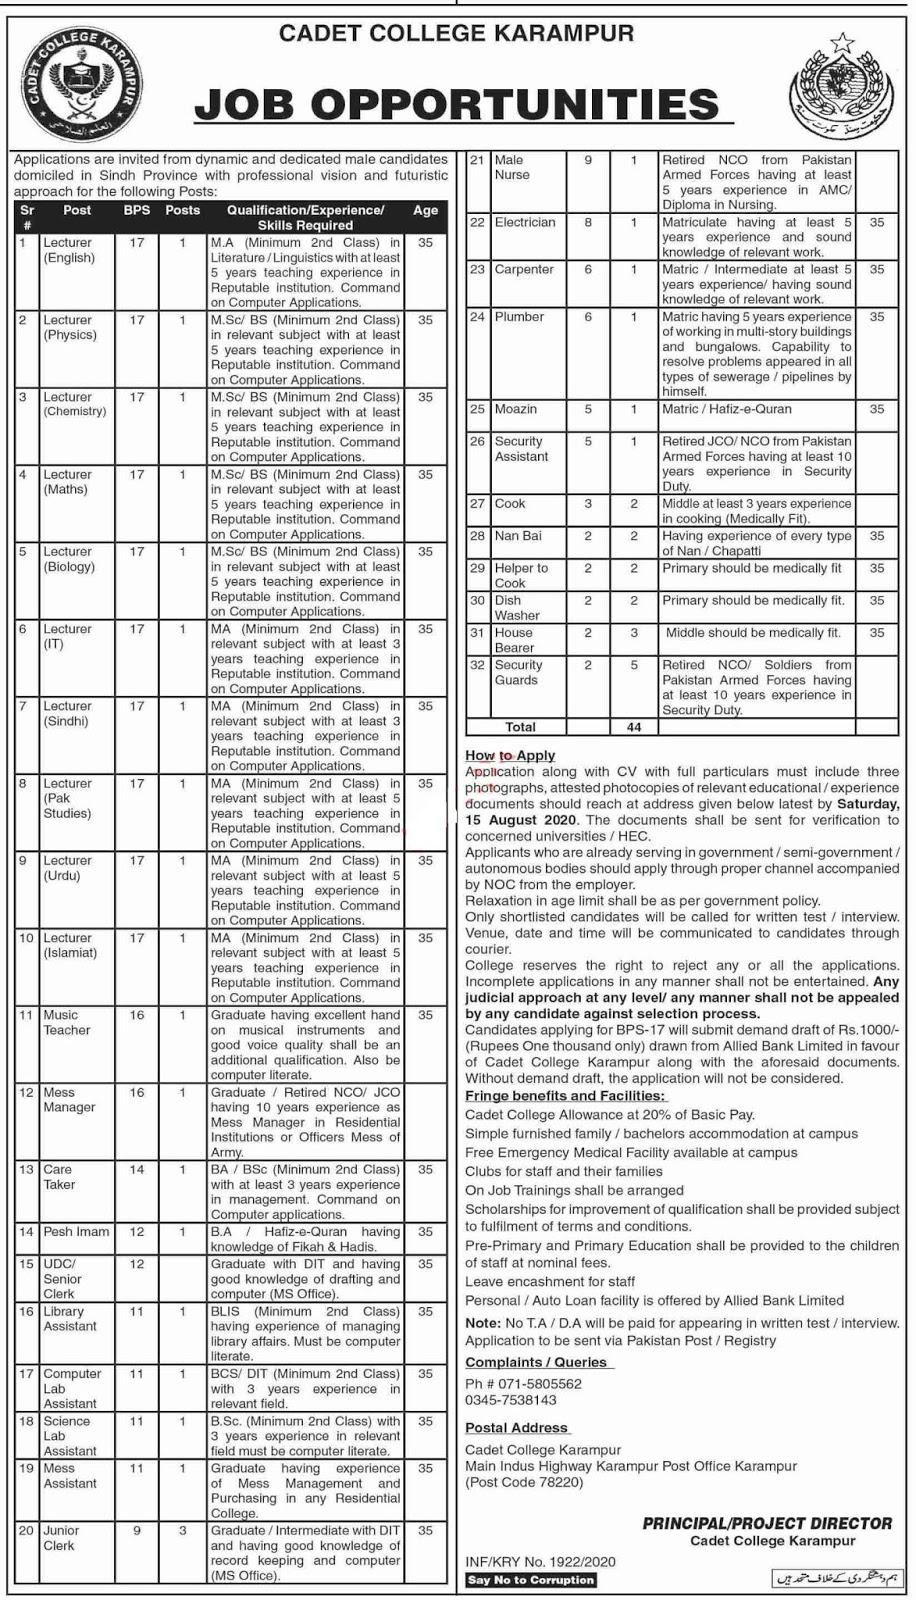 Cadet College Karampur Jobs 2020 for Lecturers, Computer Lab Assistant, Junior Clerk & more